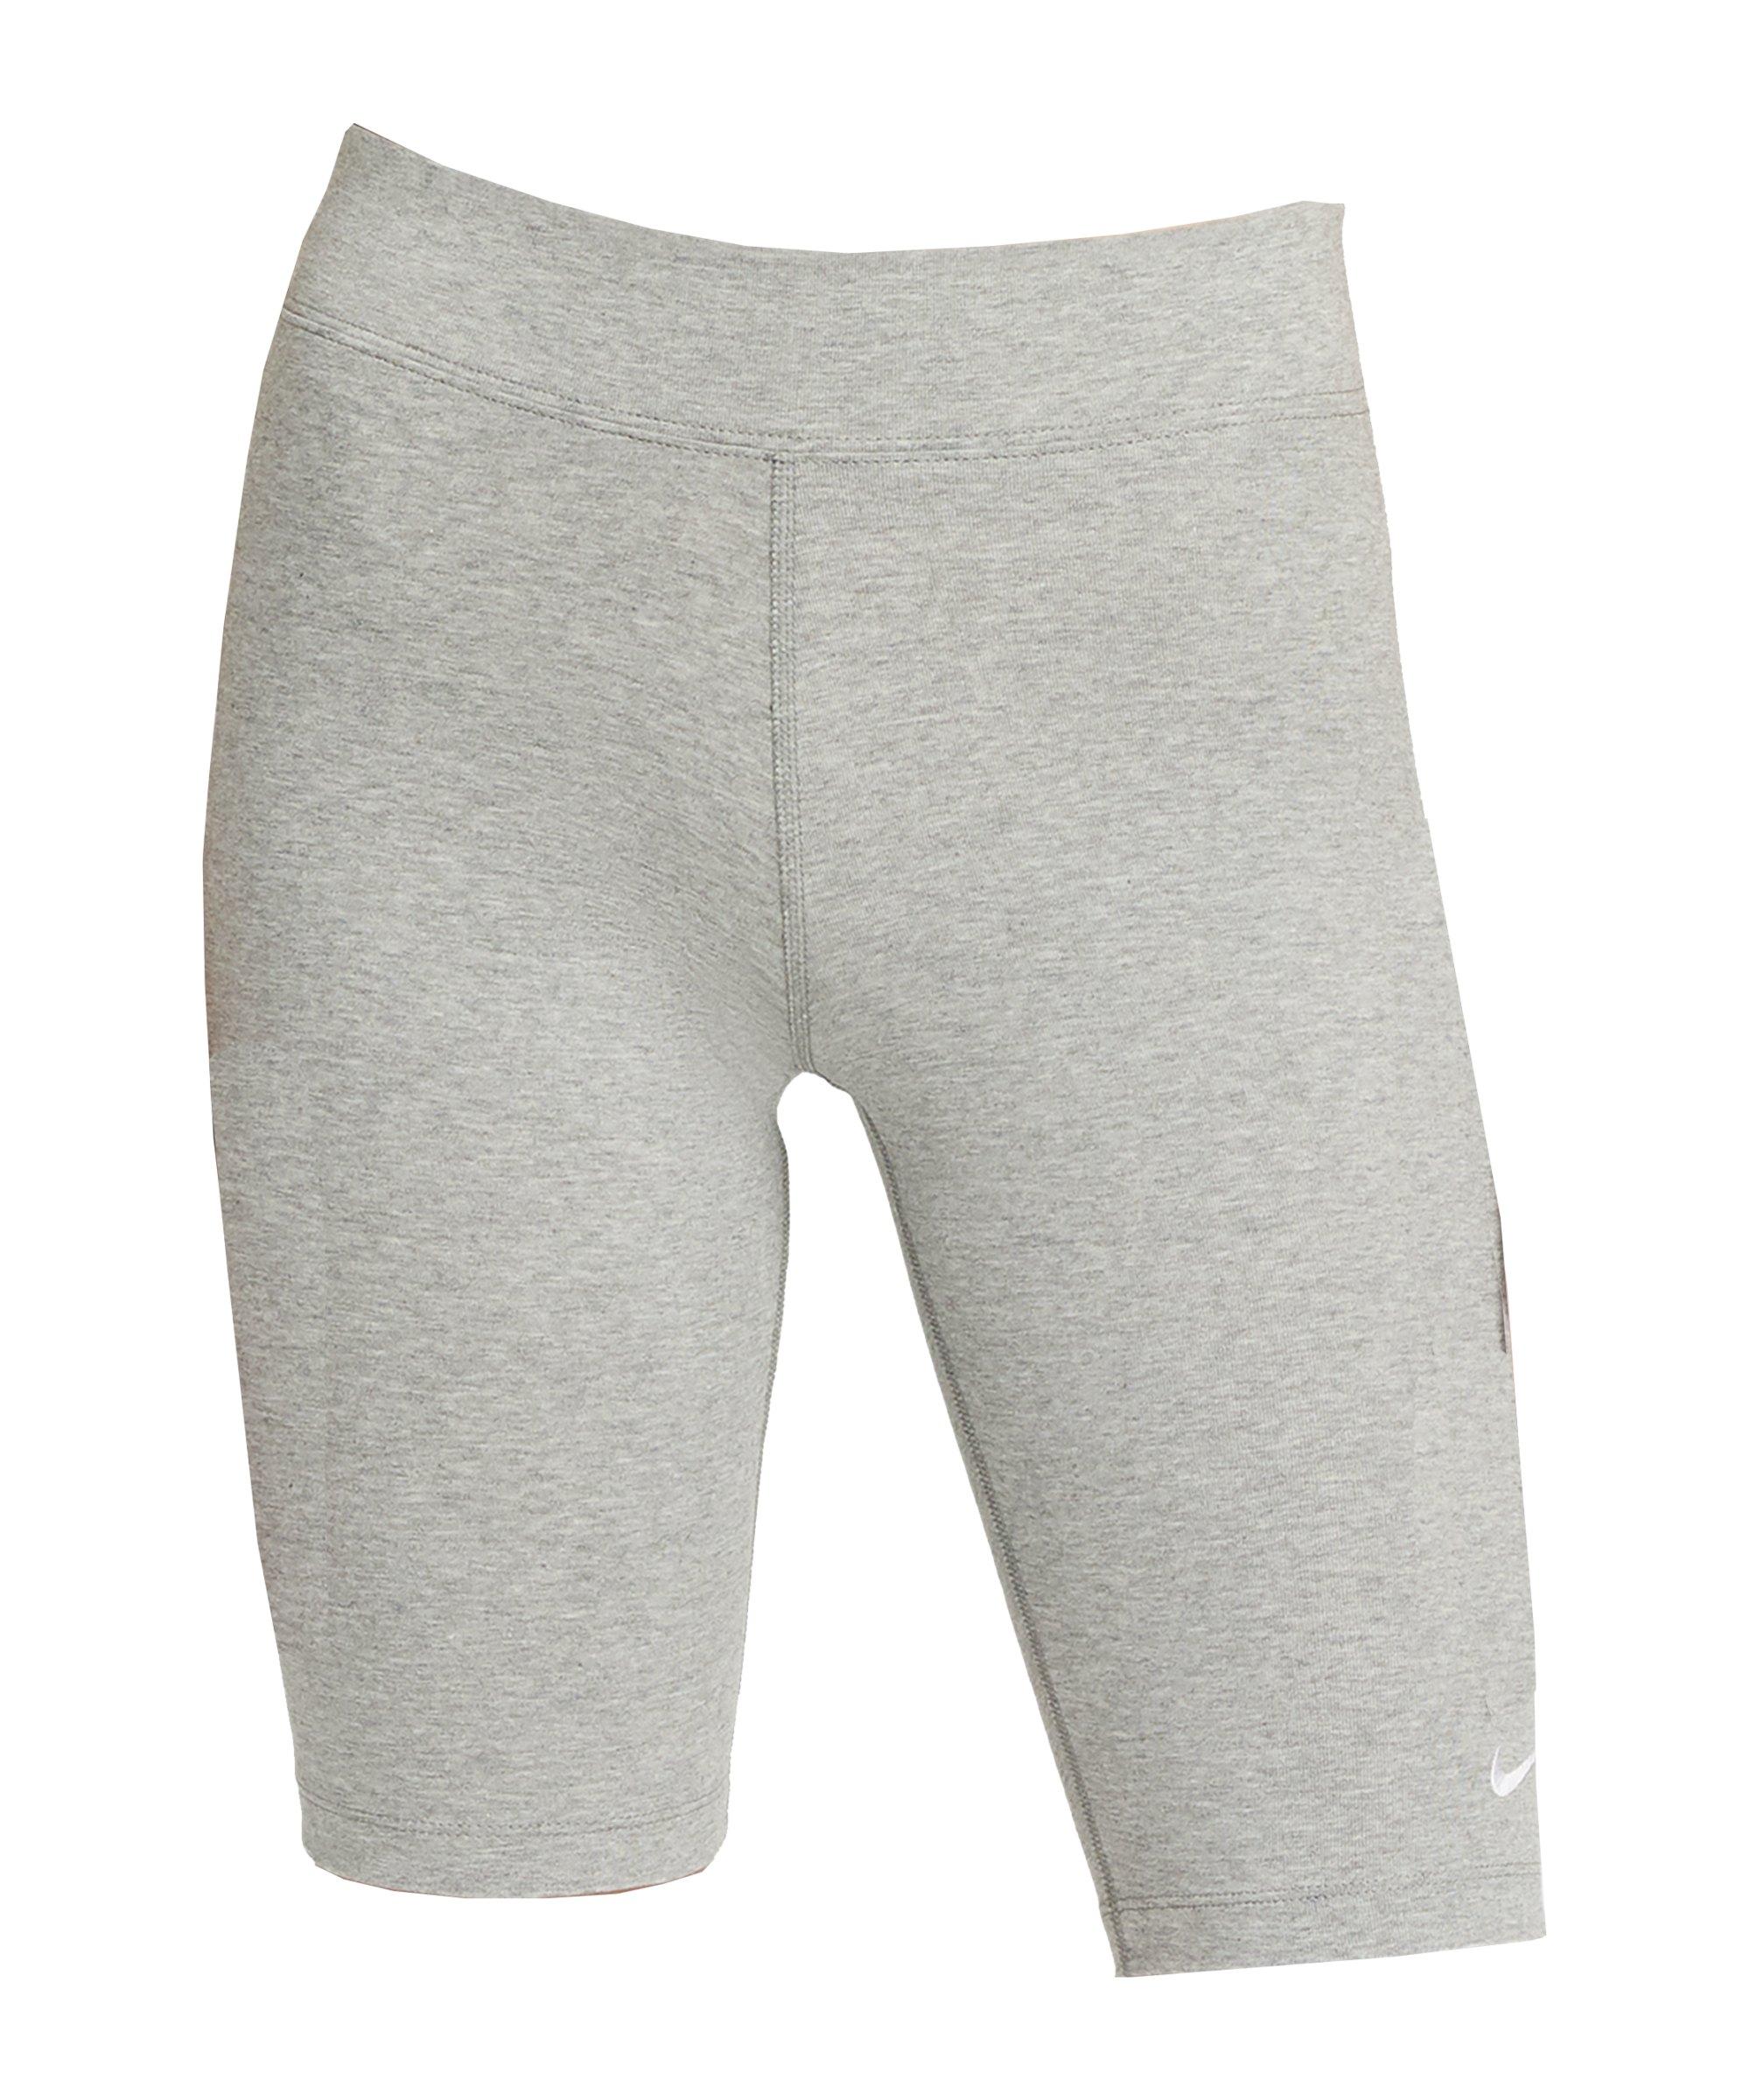 Nike Essential Biker Short Damen Grau F063 - grau